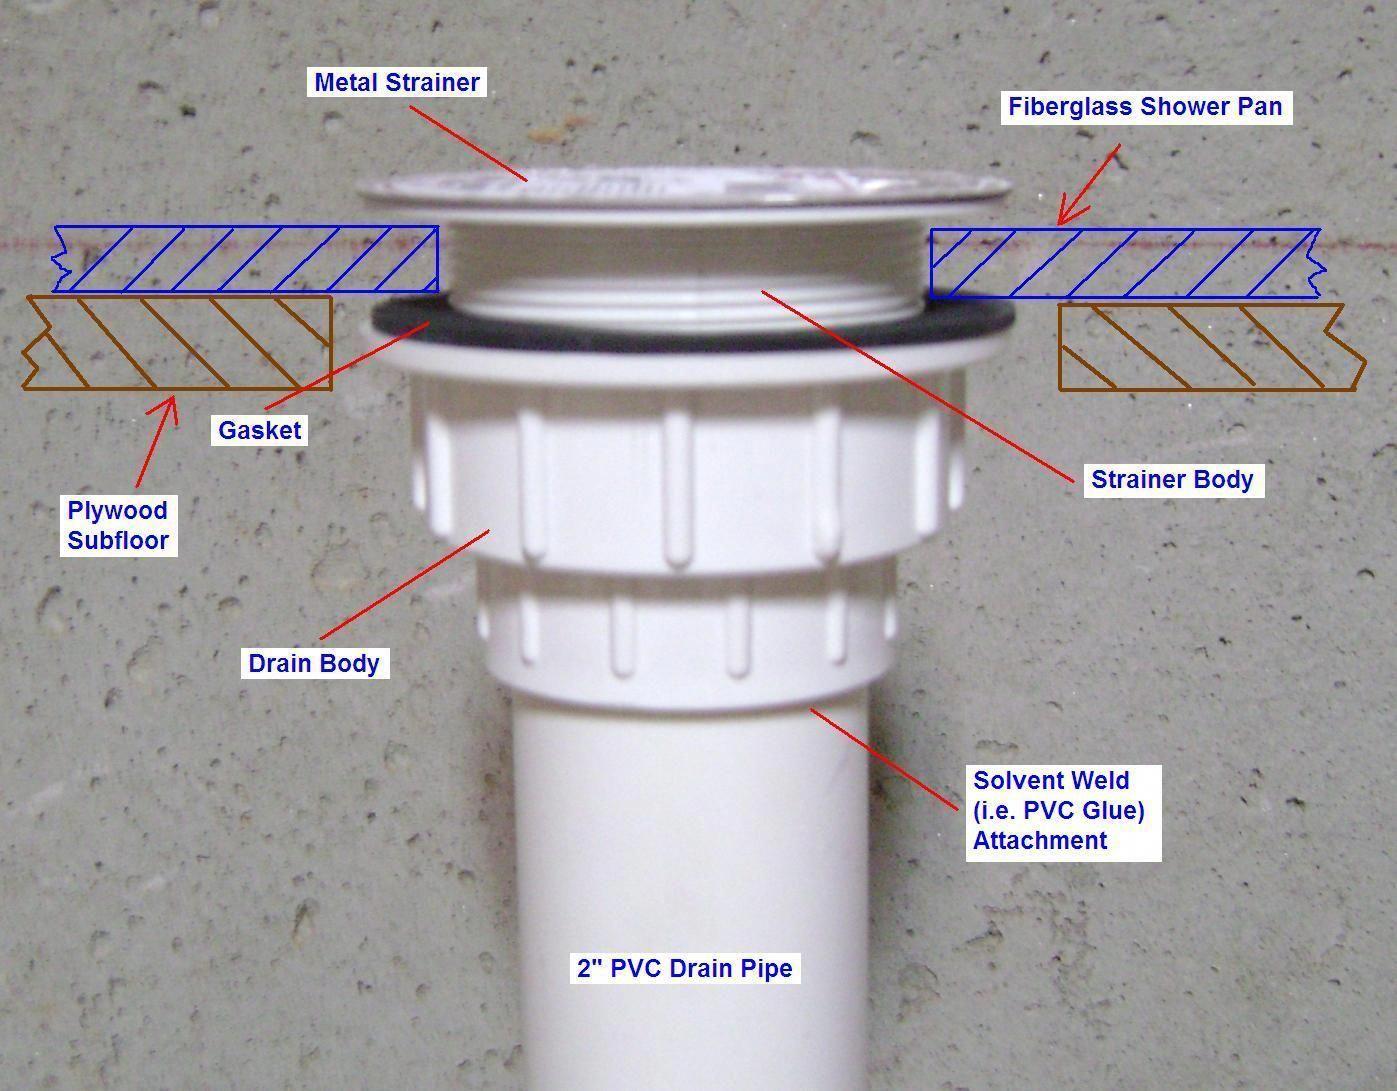 Toilet Plumbing Diagram Rv Plumbing Vent Plumbing Warehouse